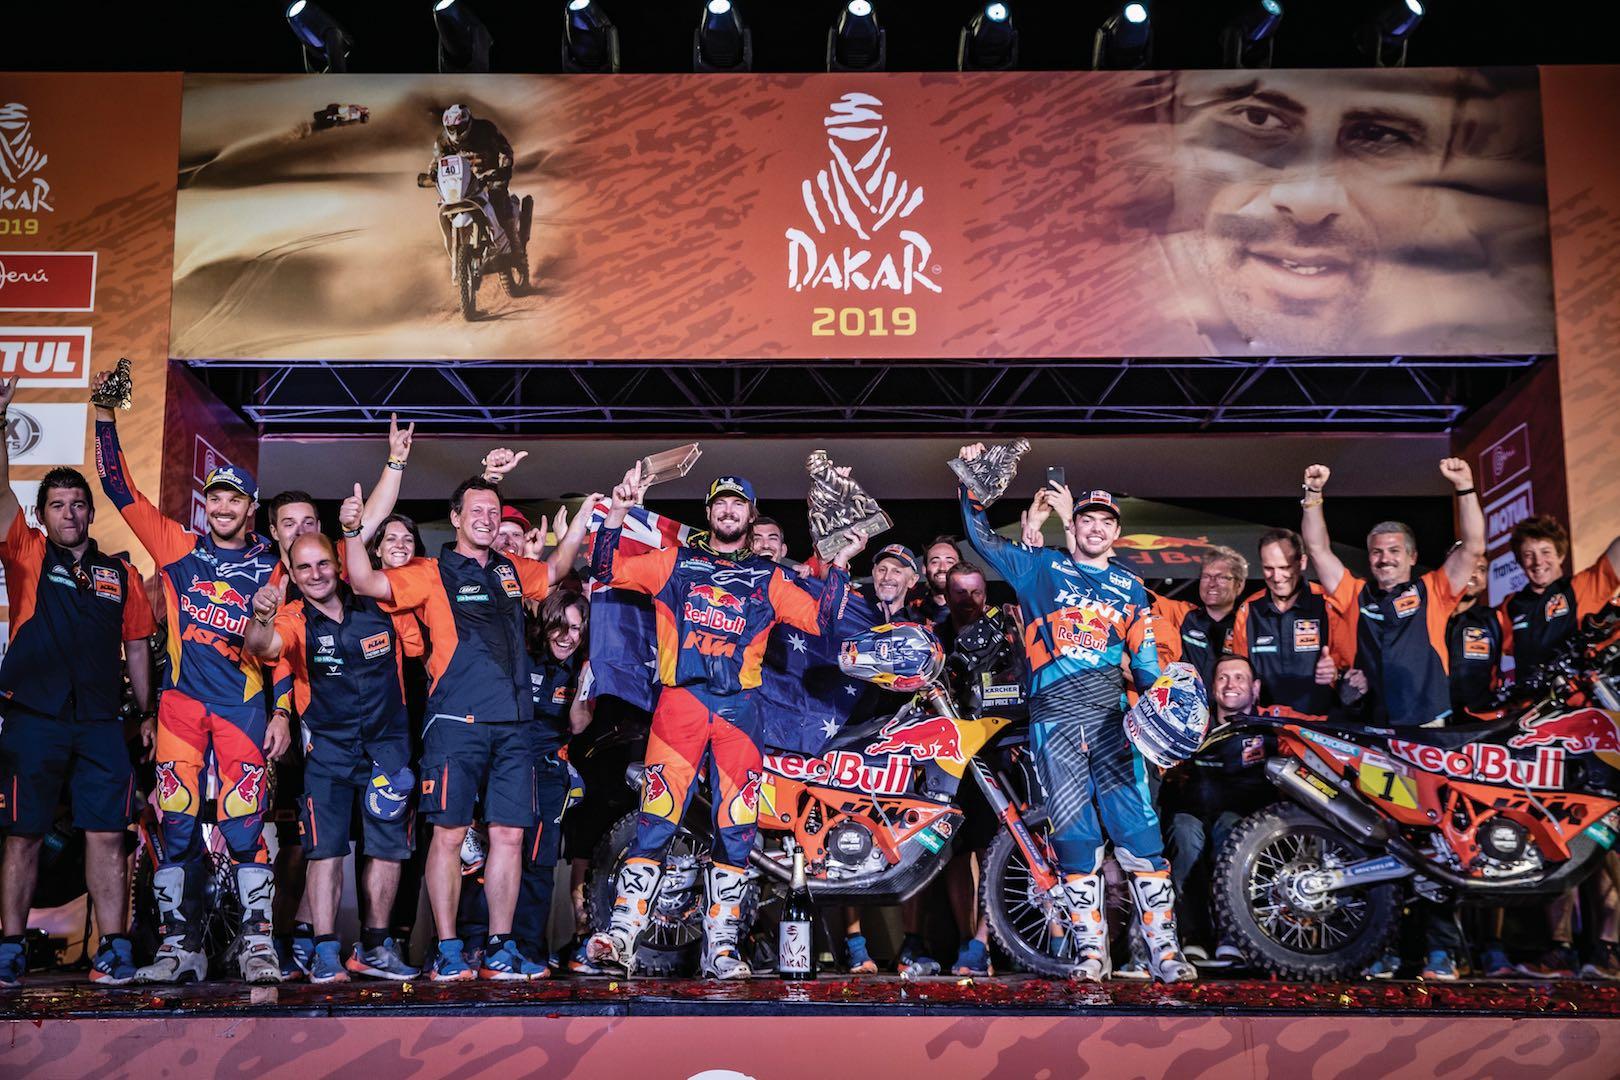 2019 Dakar Rally Results: KTM Podium